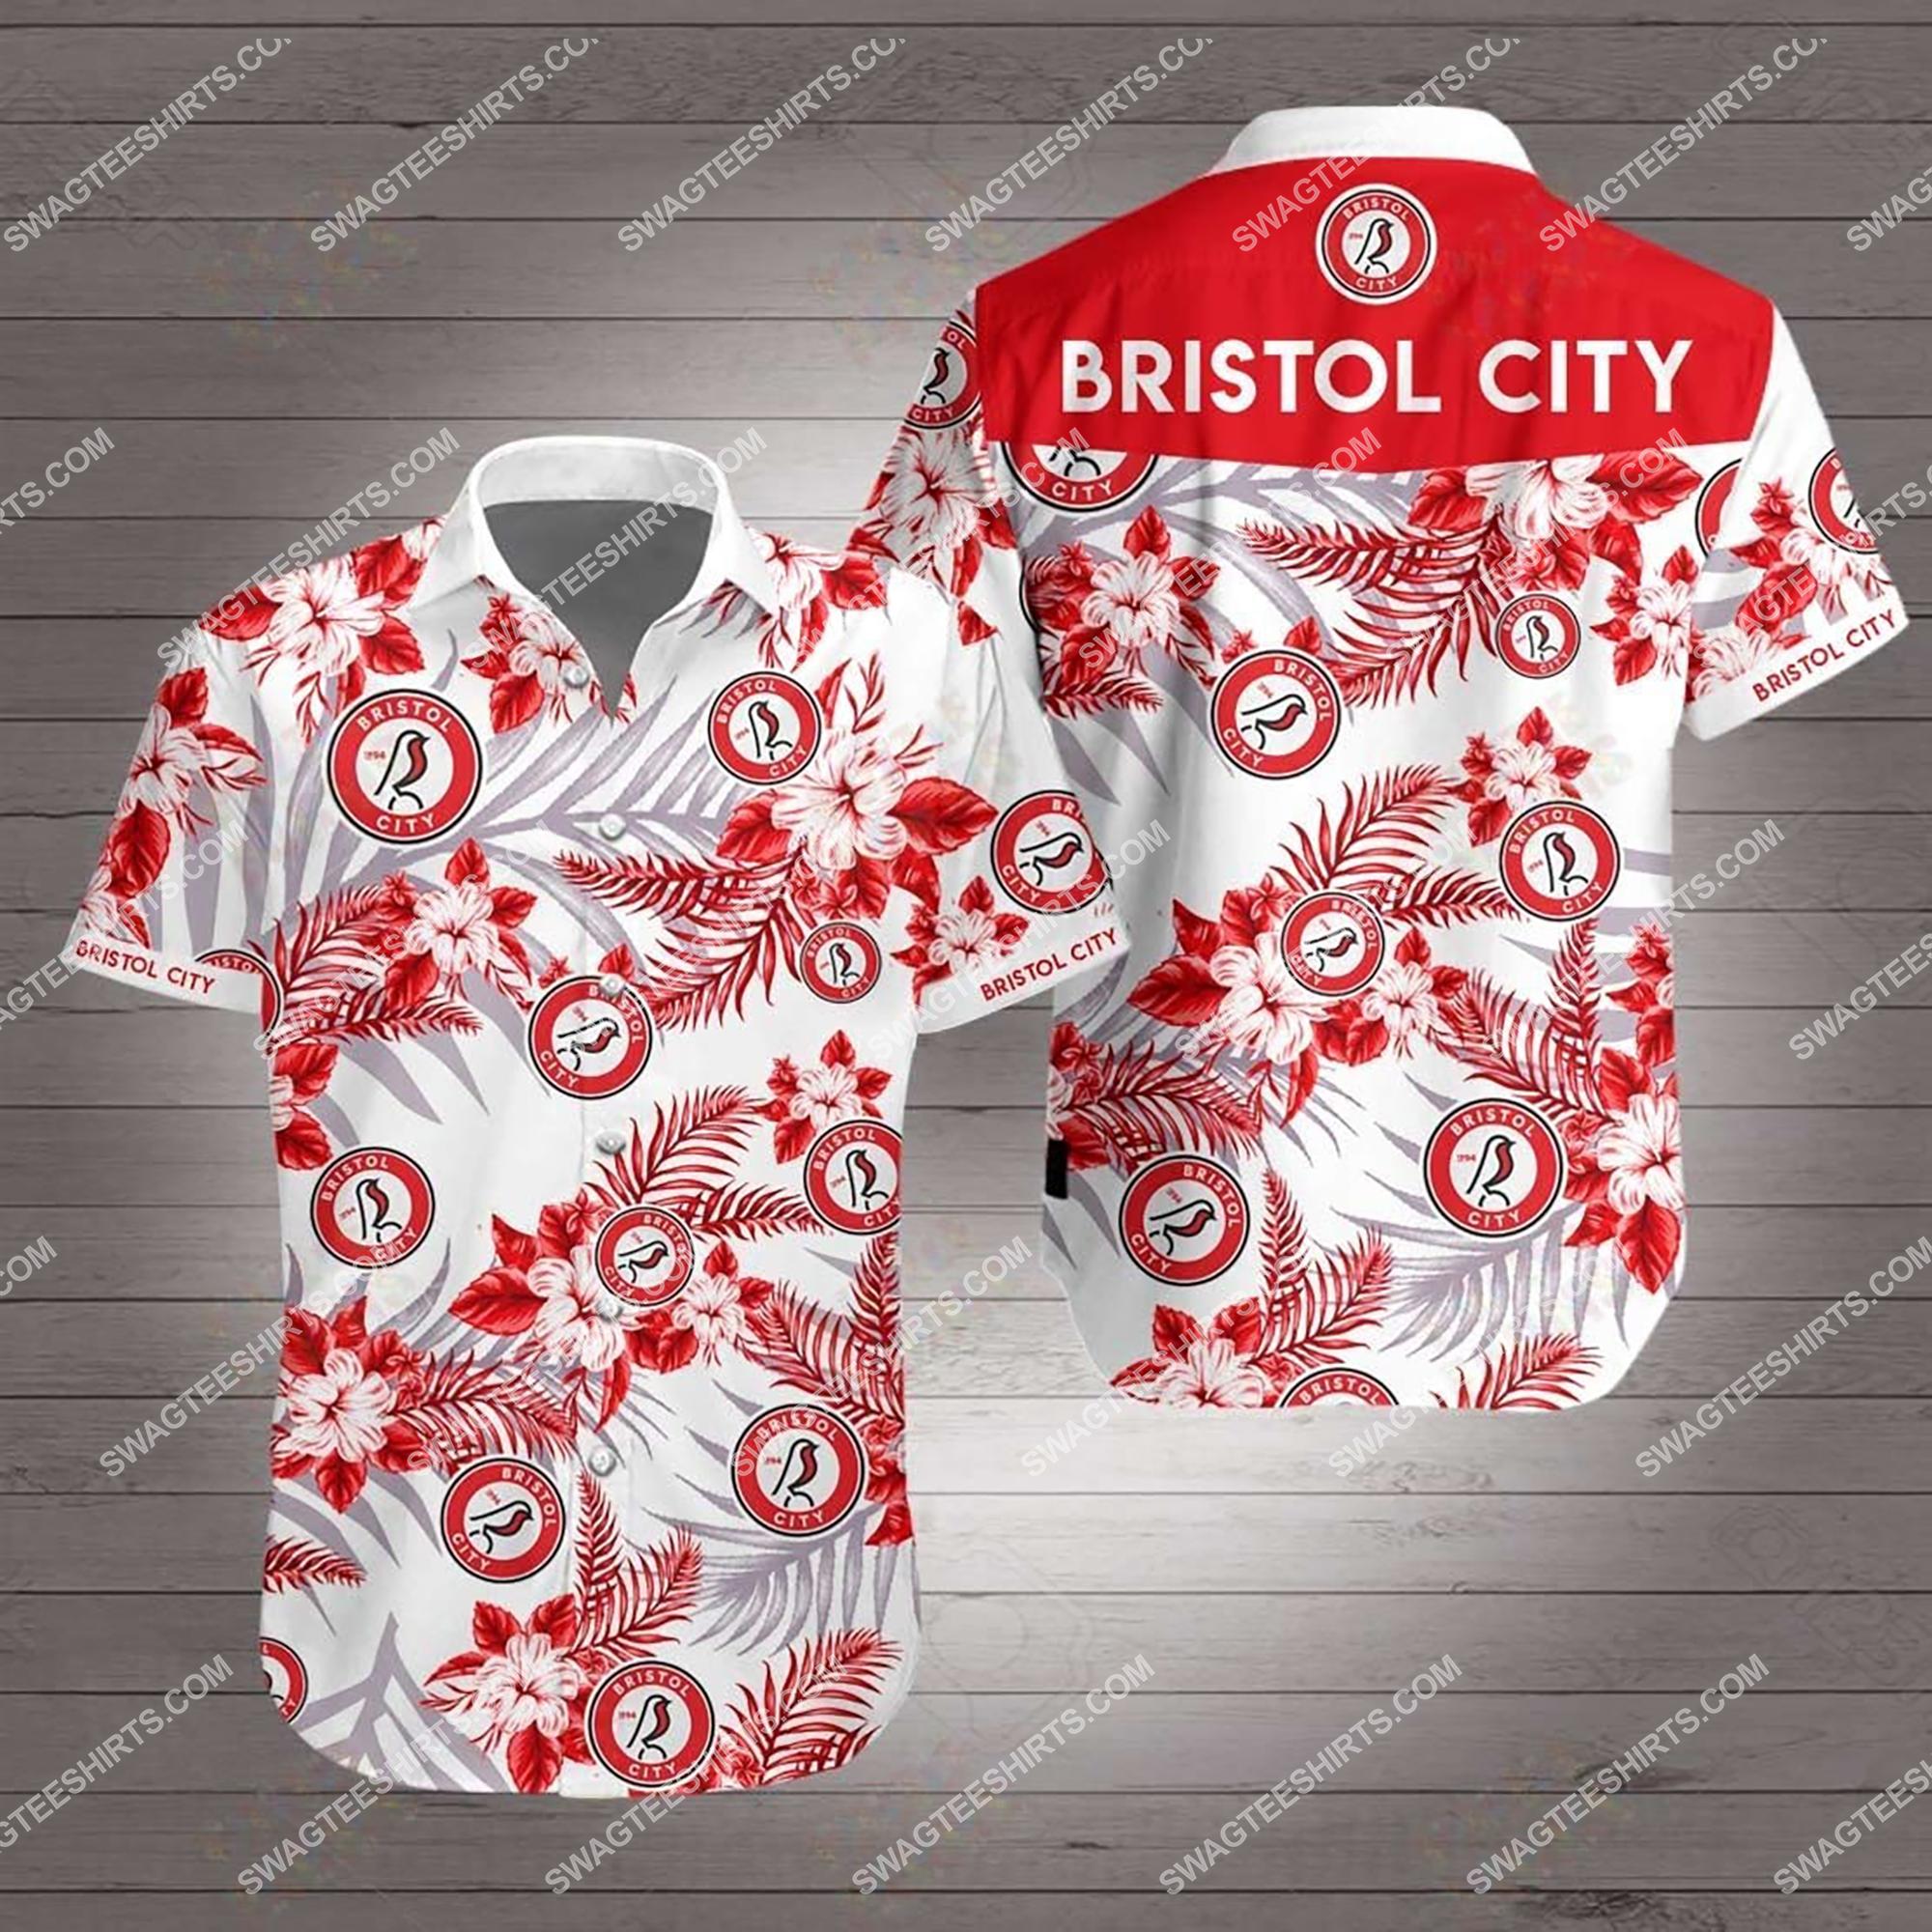 the bristol city fc full printing summer hawaiian shirt 2 - Copy